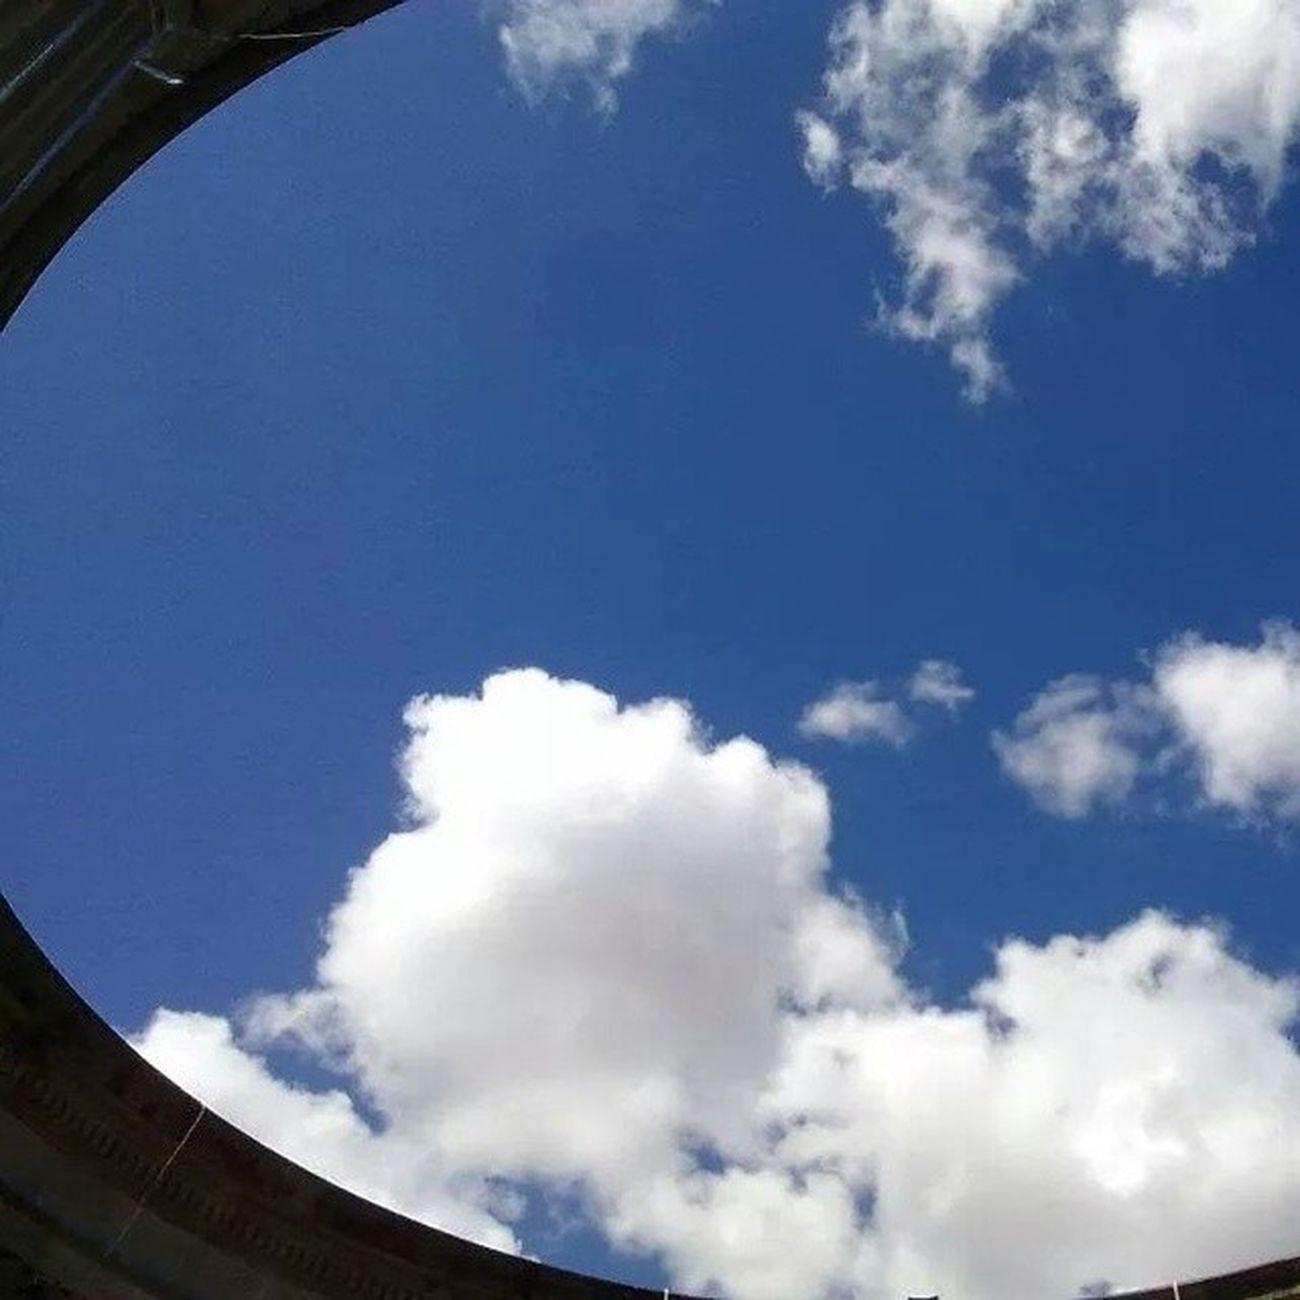 Pozo de cielo / Sky well Quetzaltenango Xela Guatemala Cielo Nubes Sinfiltro Guate Viajes  2011 Recuerdos Pozo  Sky Clouds Nofilter Travel Memories Well  Travel TheRealGuatemala PerhapsYouNeedALittleGuatemala Vscocam VSCO Igers Guategram